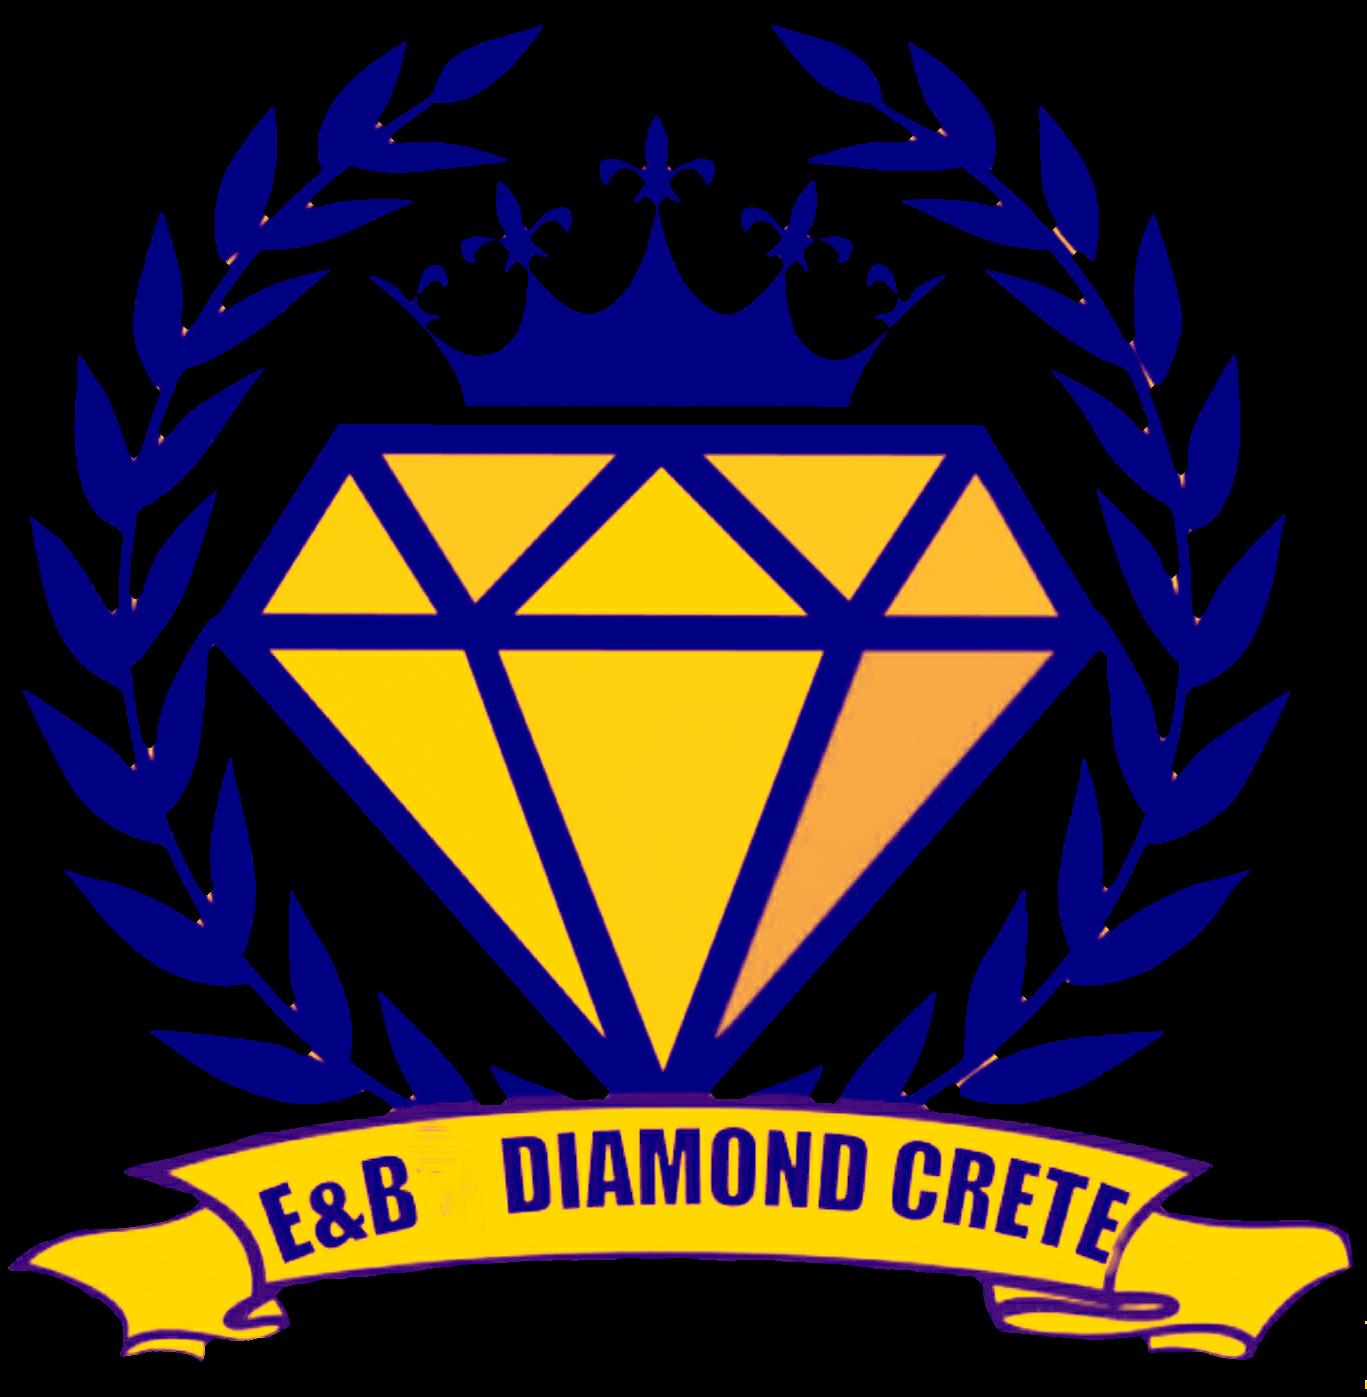 E&B Diamond Crete inc.